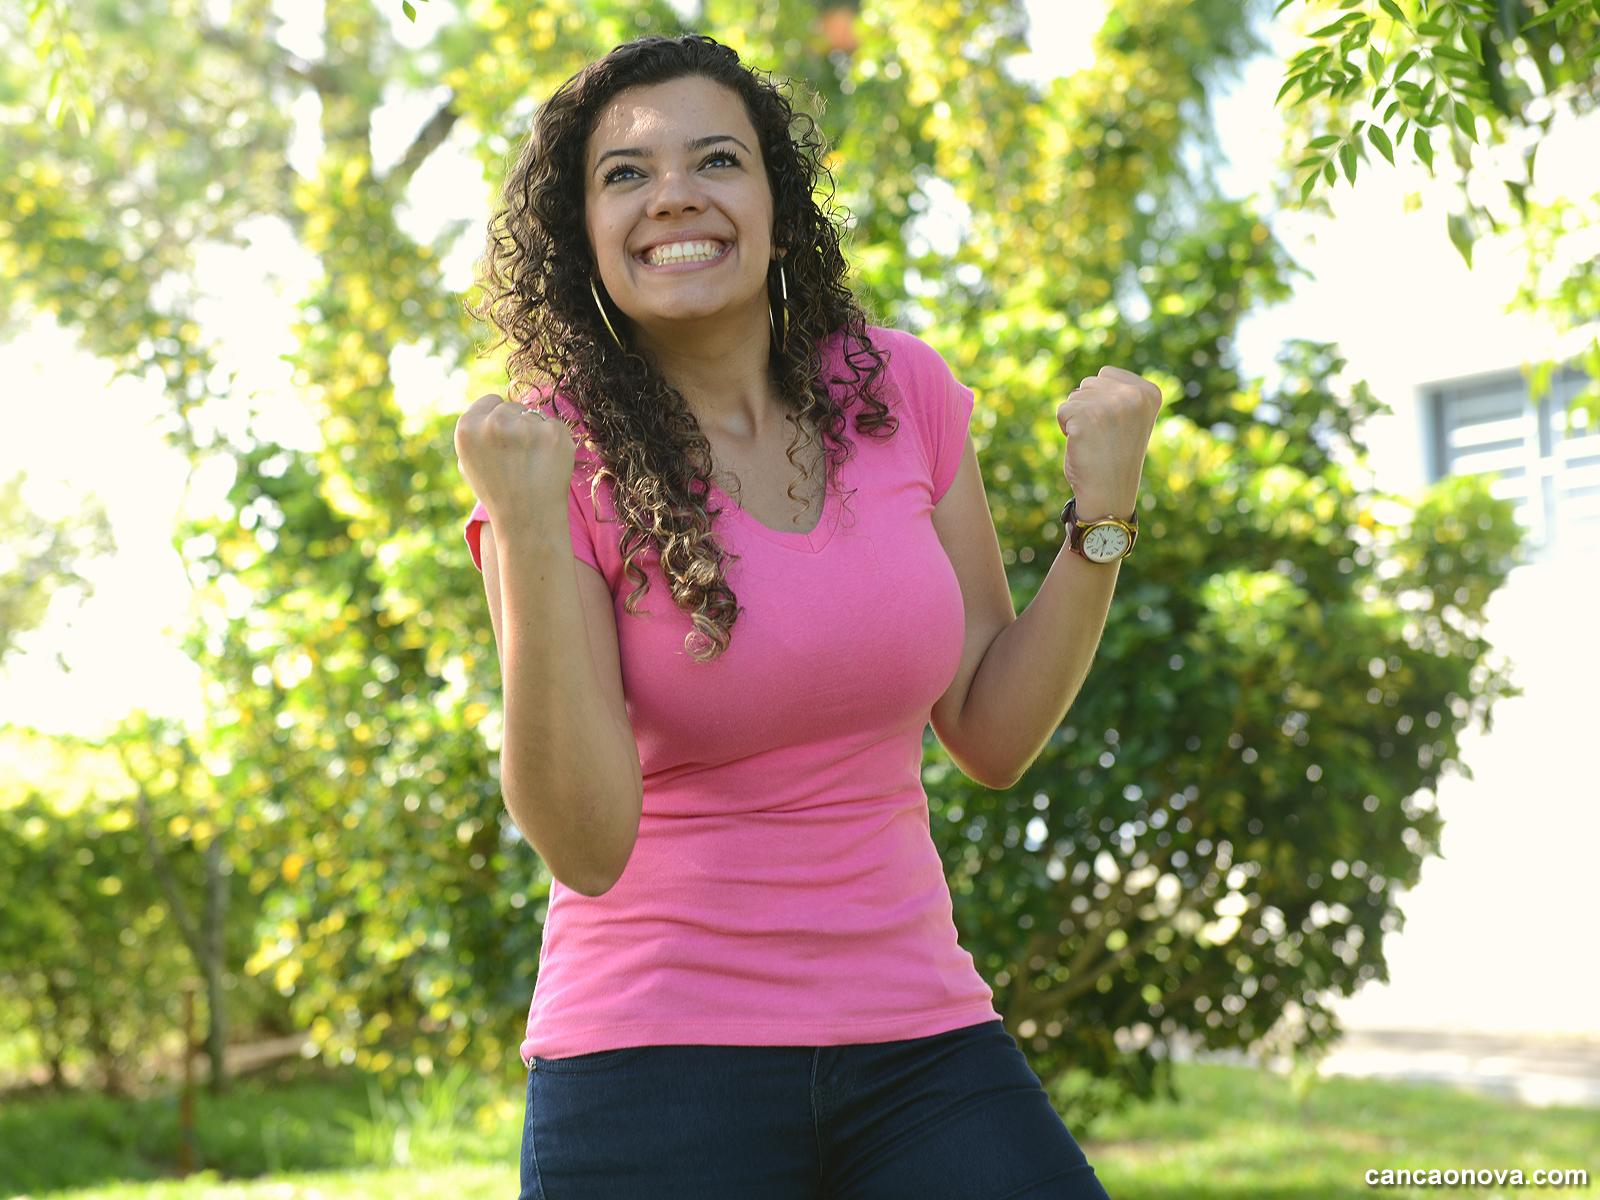 A fortaleza da mulher para vencer os desafios